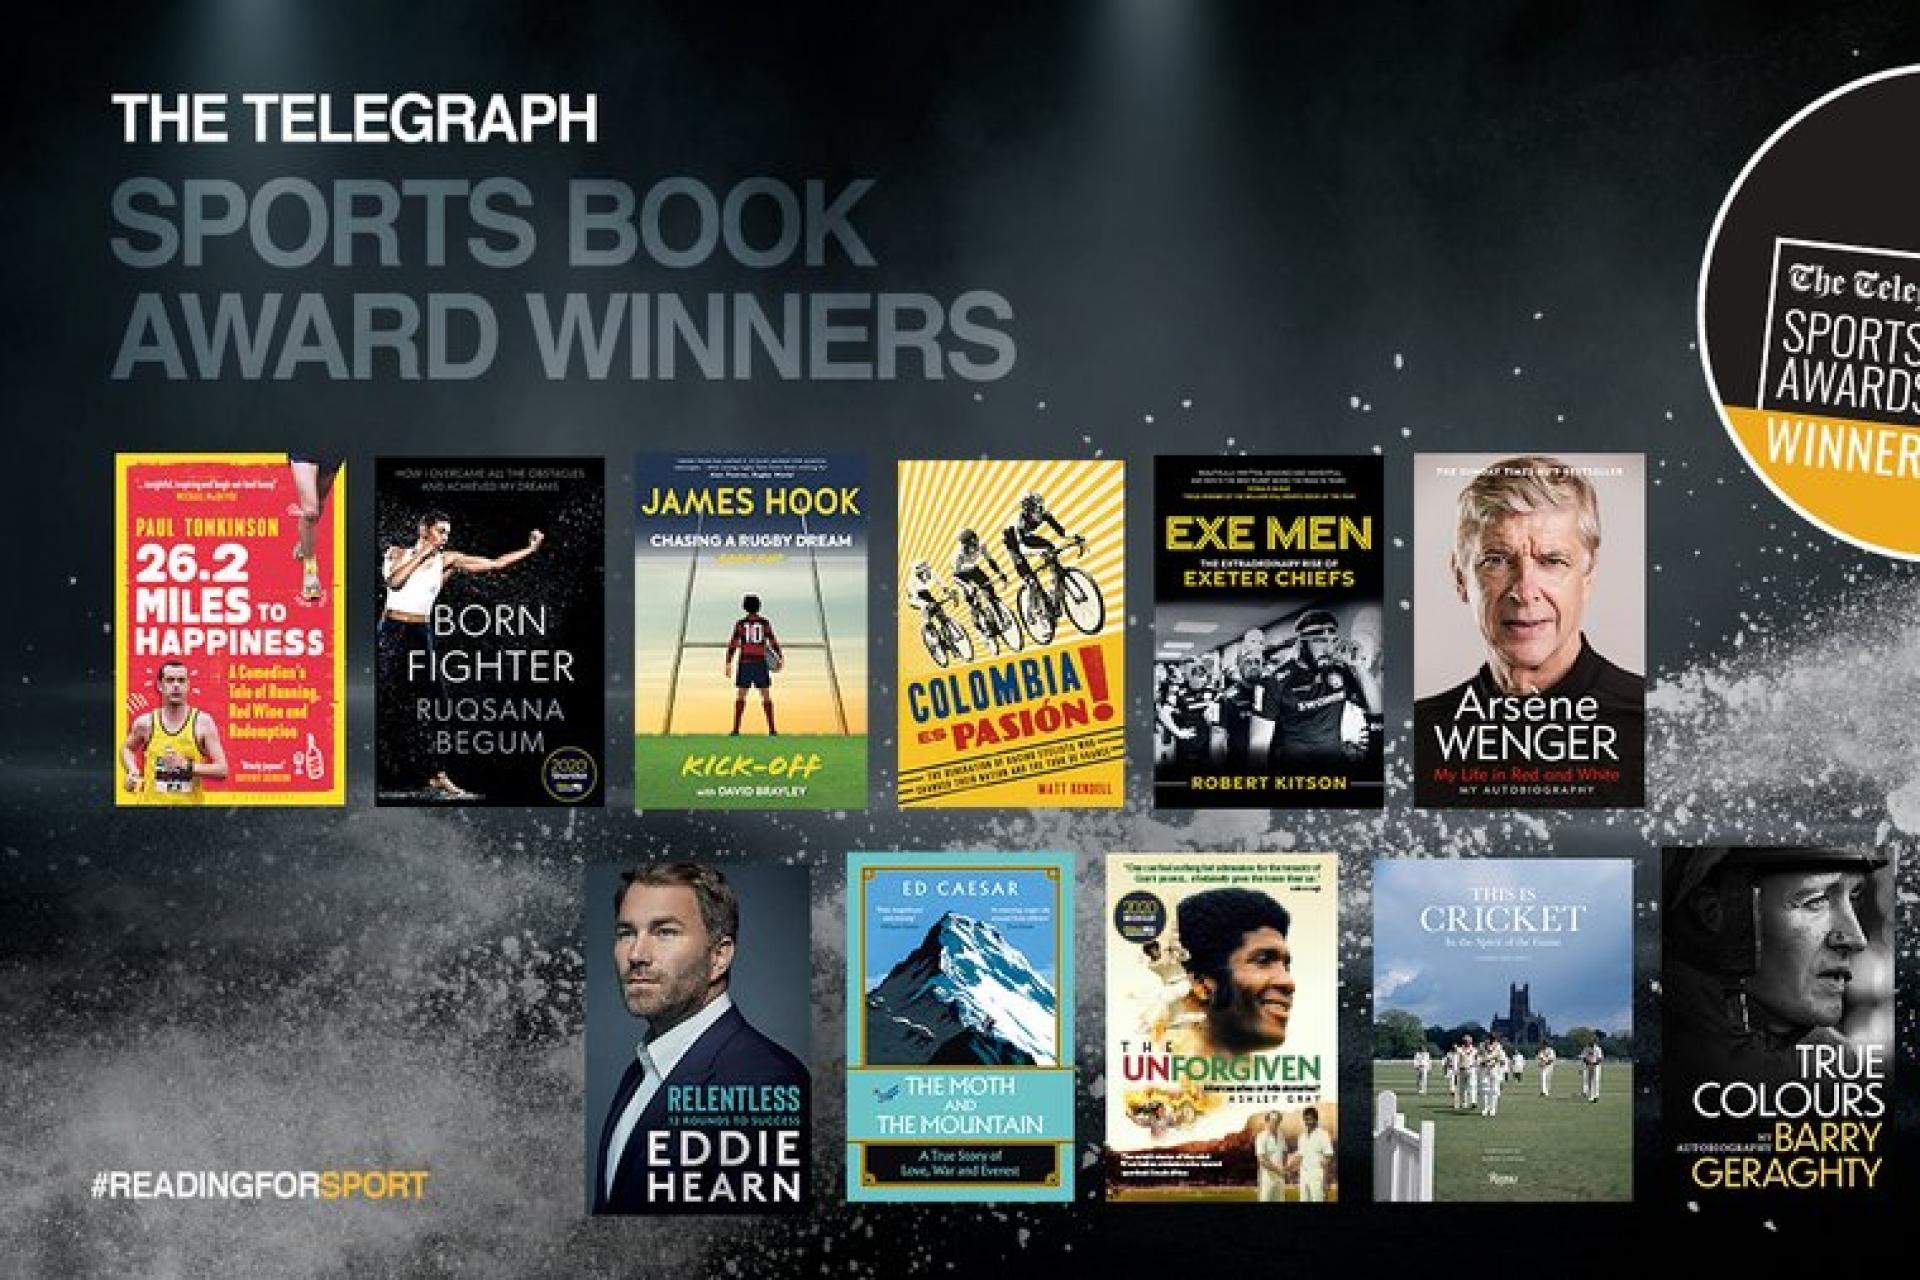 The Telegraph 2021 Sports Book Award Winners Announced